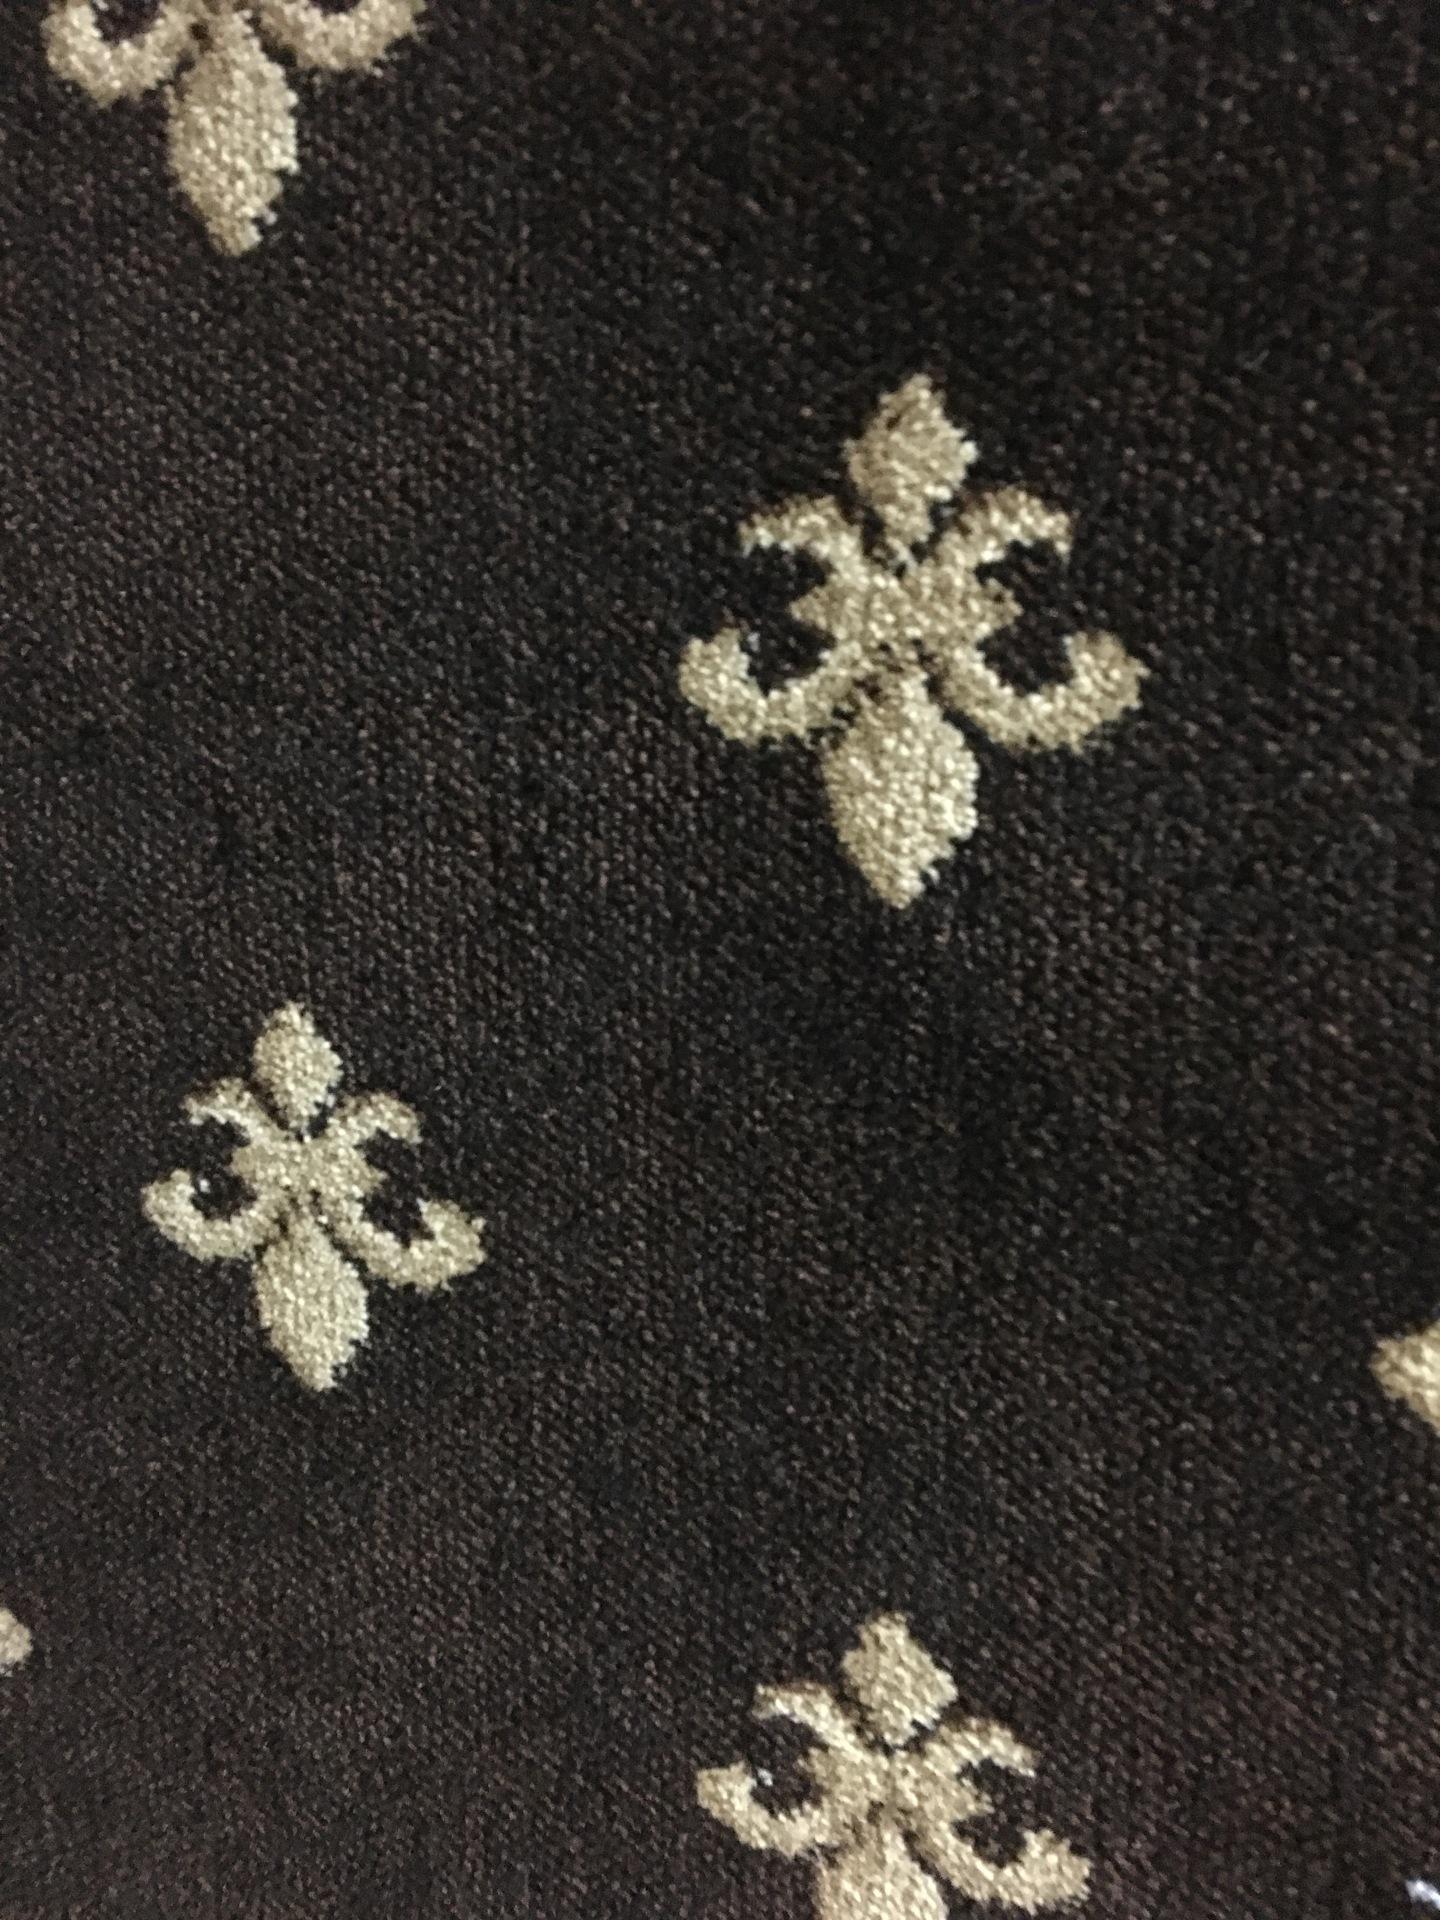 Carpet, area rugs, natural fibers, carpeting, rug, wall to wall carpet, plush, thick, comfortable, soft, clean carpet, dark, pattern, black with pattern, diamond pattern carpet